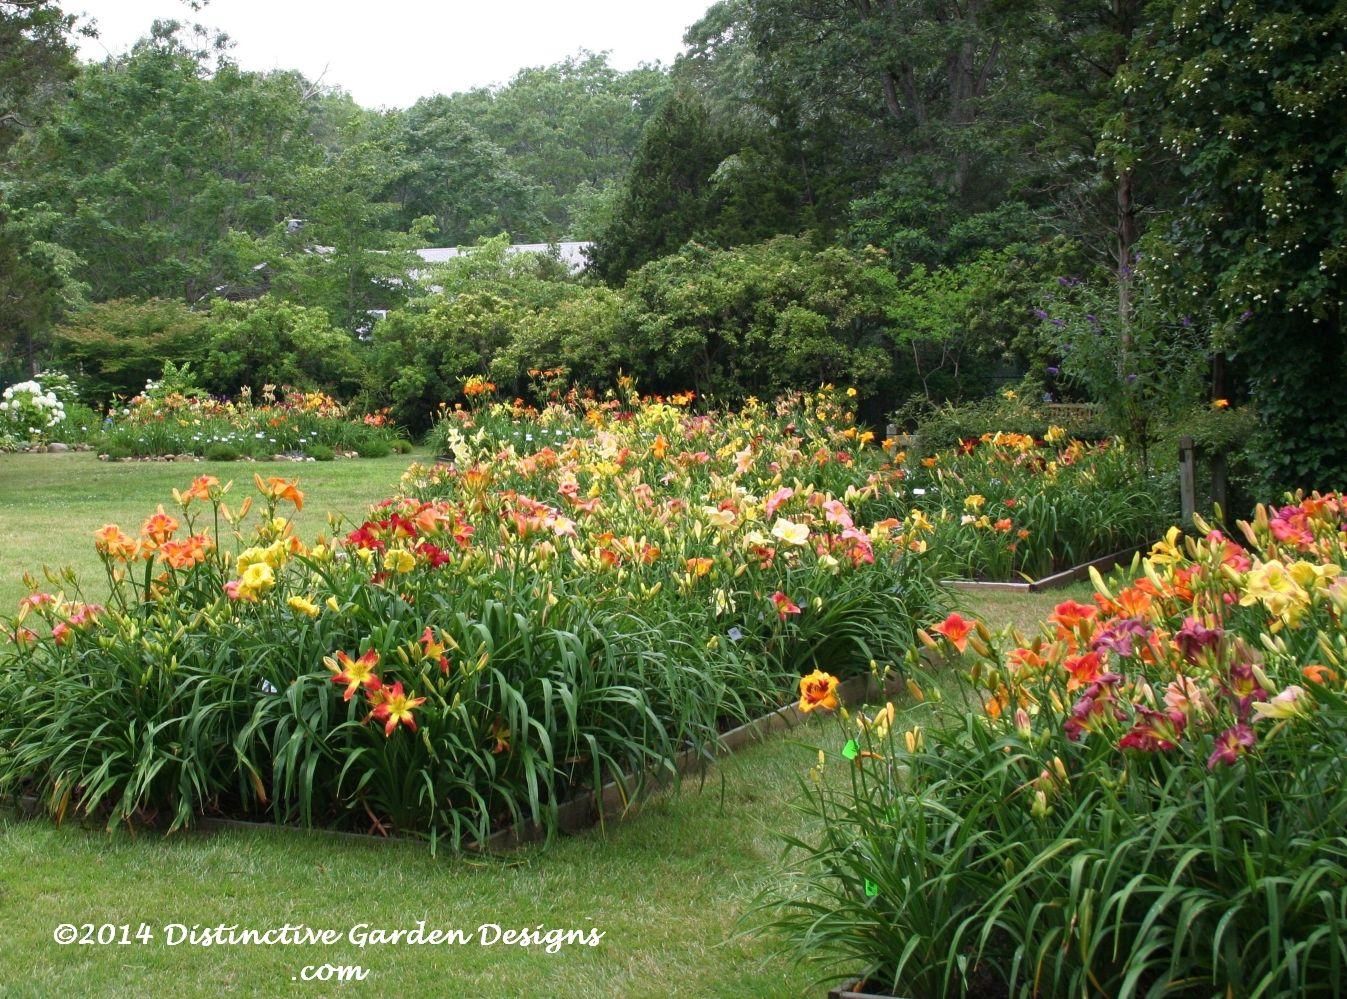 4f0b1a70924a5fcd2747fc29b8013031 - What Zone Is Long Island For Gardening